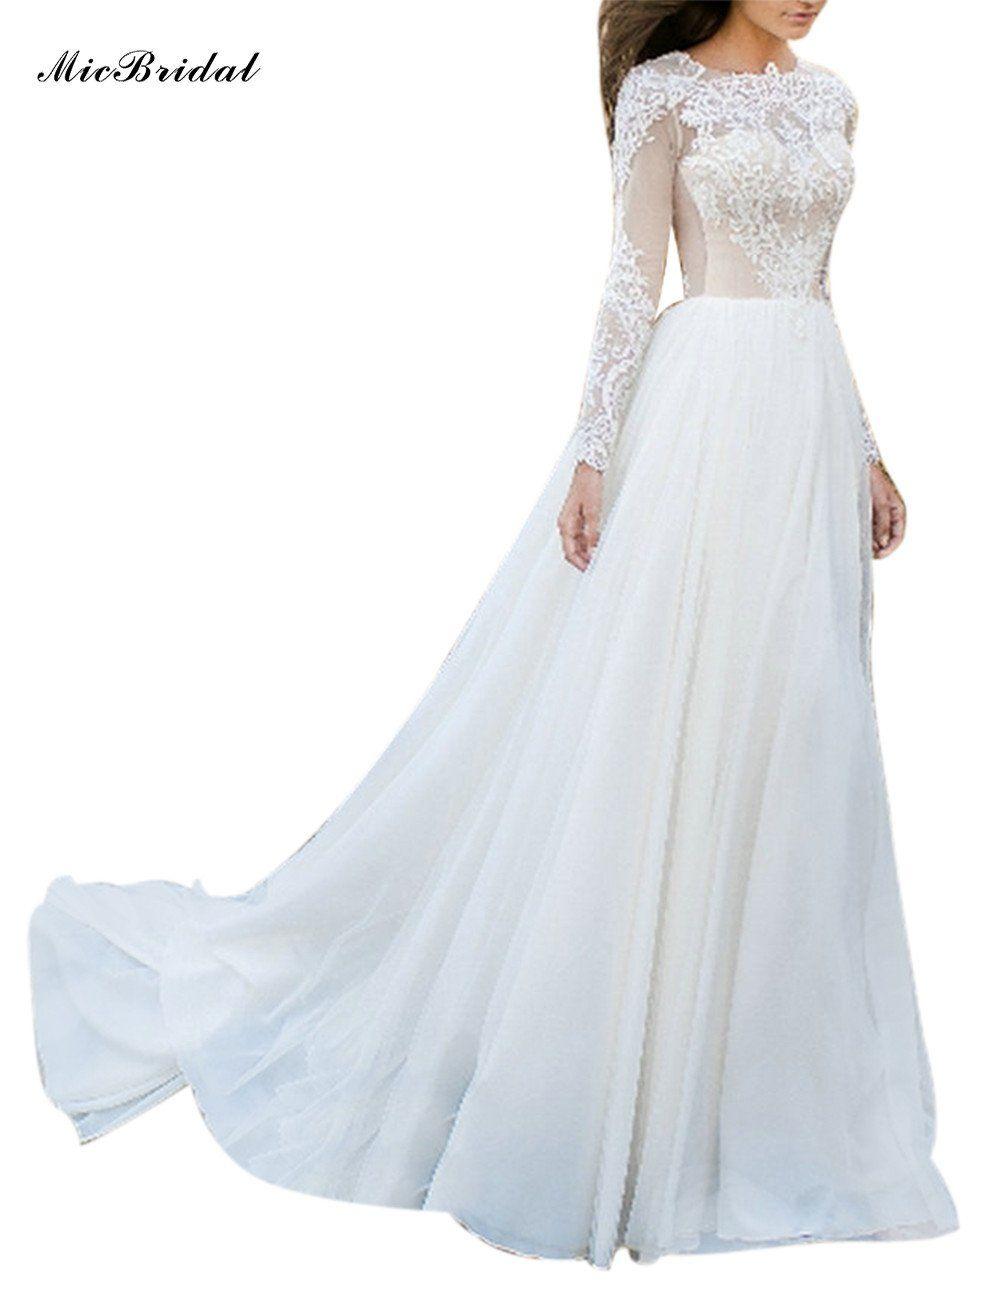 Micbridal Simple Long Sleeve Muslim Wedding Dress Long Train White Chiffon Bridalgowns Merm Long Train Wedding Dress Wedding Dresses Wedding Dress Necklines [ 1300 x 1000 Pixel ]